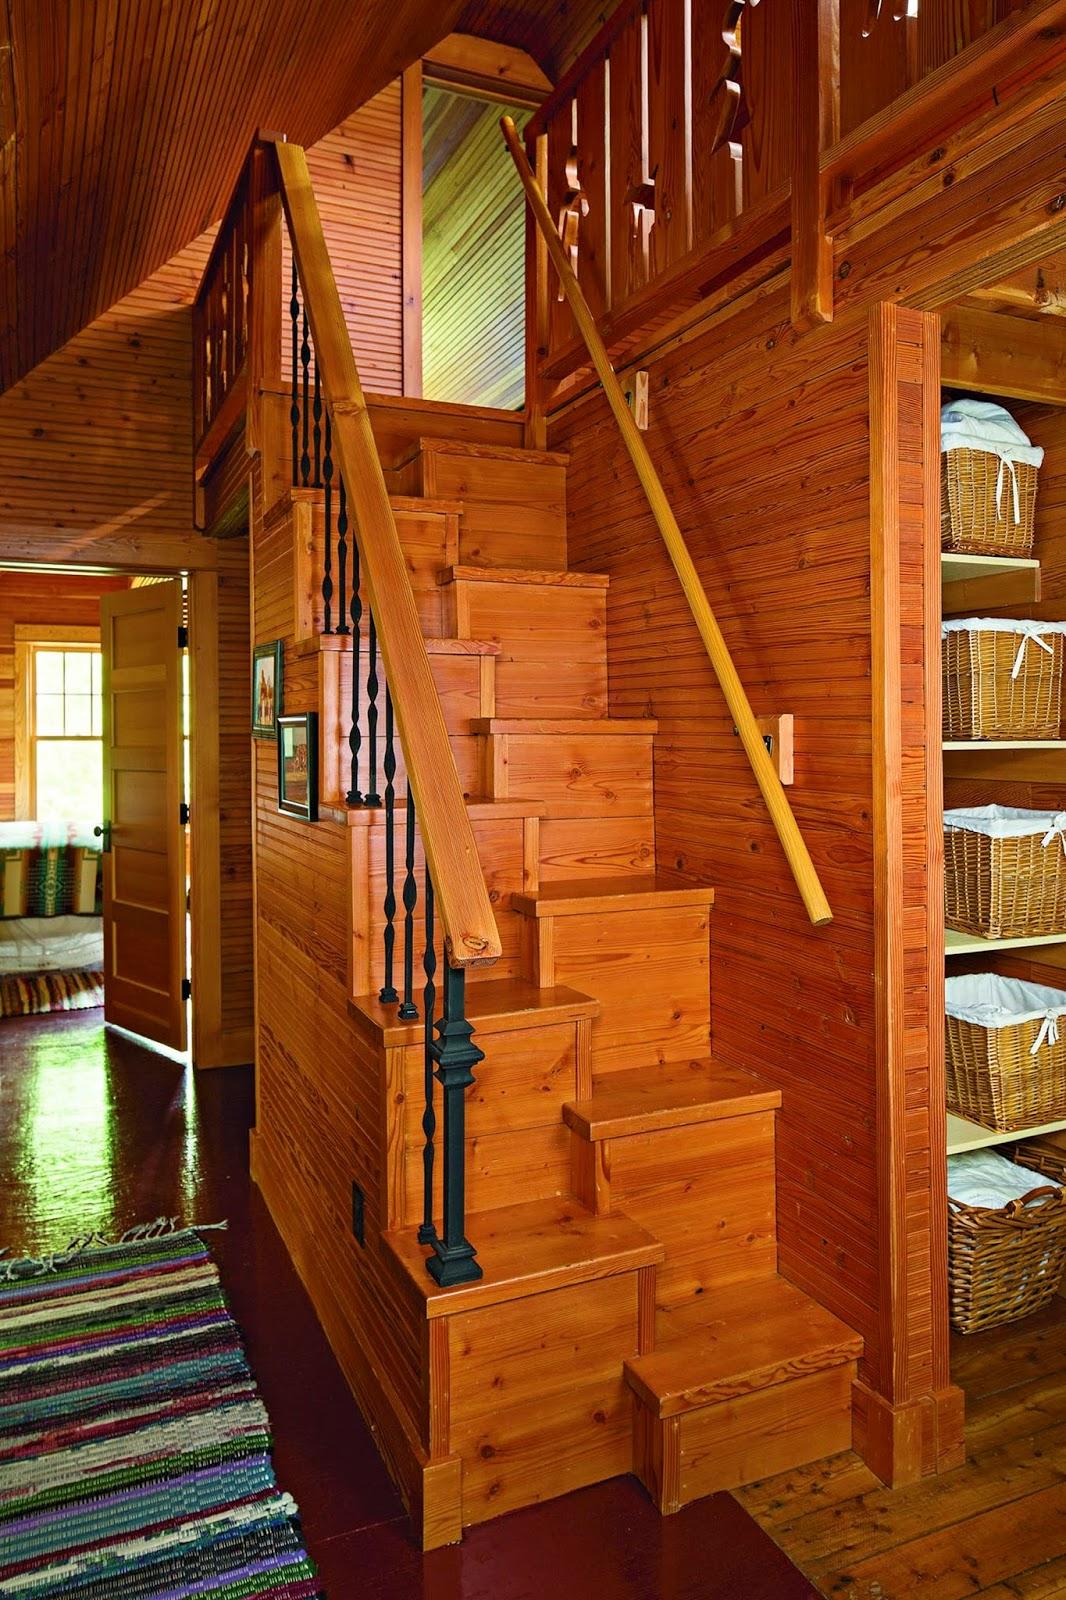 Tywkiwdbi Tai Wiki Widbee An Alternating Tread Stairway   Alternating Tread Stair Design   Staggered   Style   Wood   Multipurpose   Double Thickness Tread